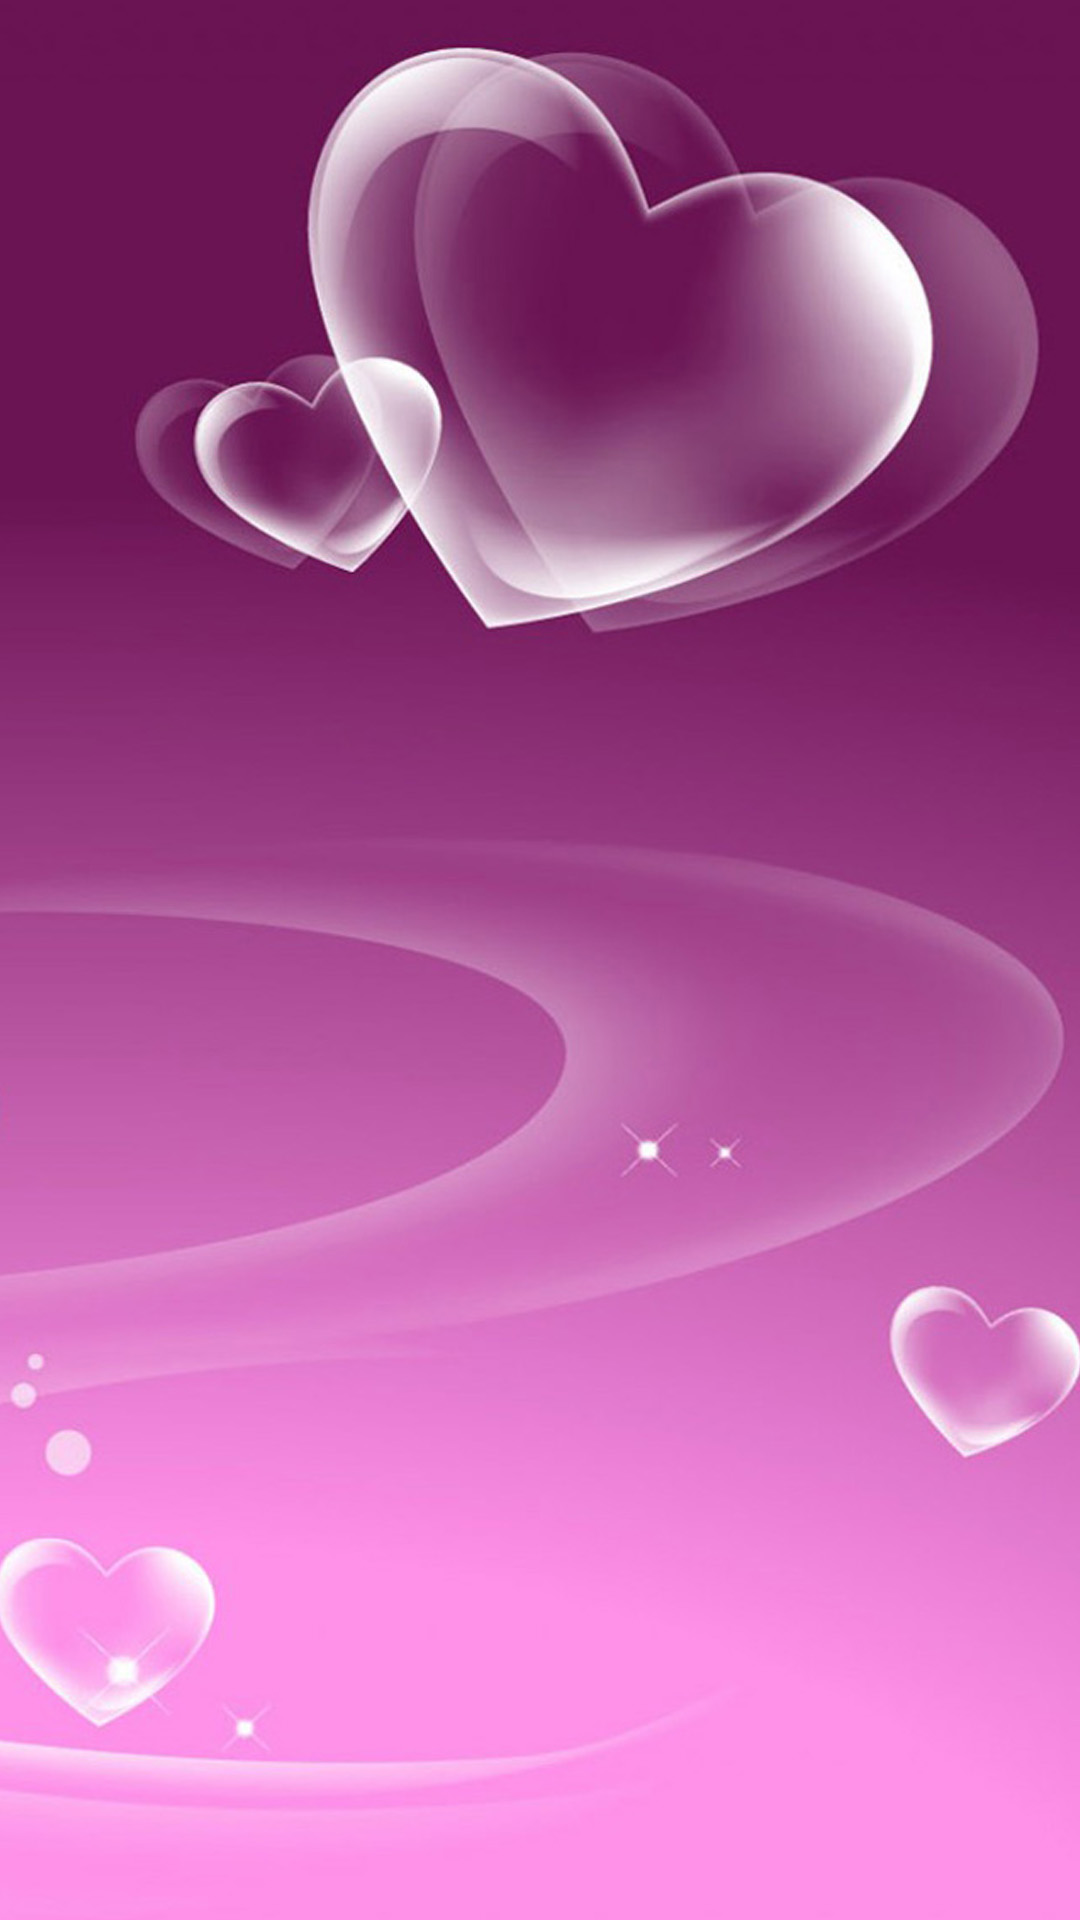 iphone6plus爱情粉色壁纸_iphone6plus爱情粉色壁纸